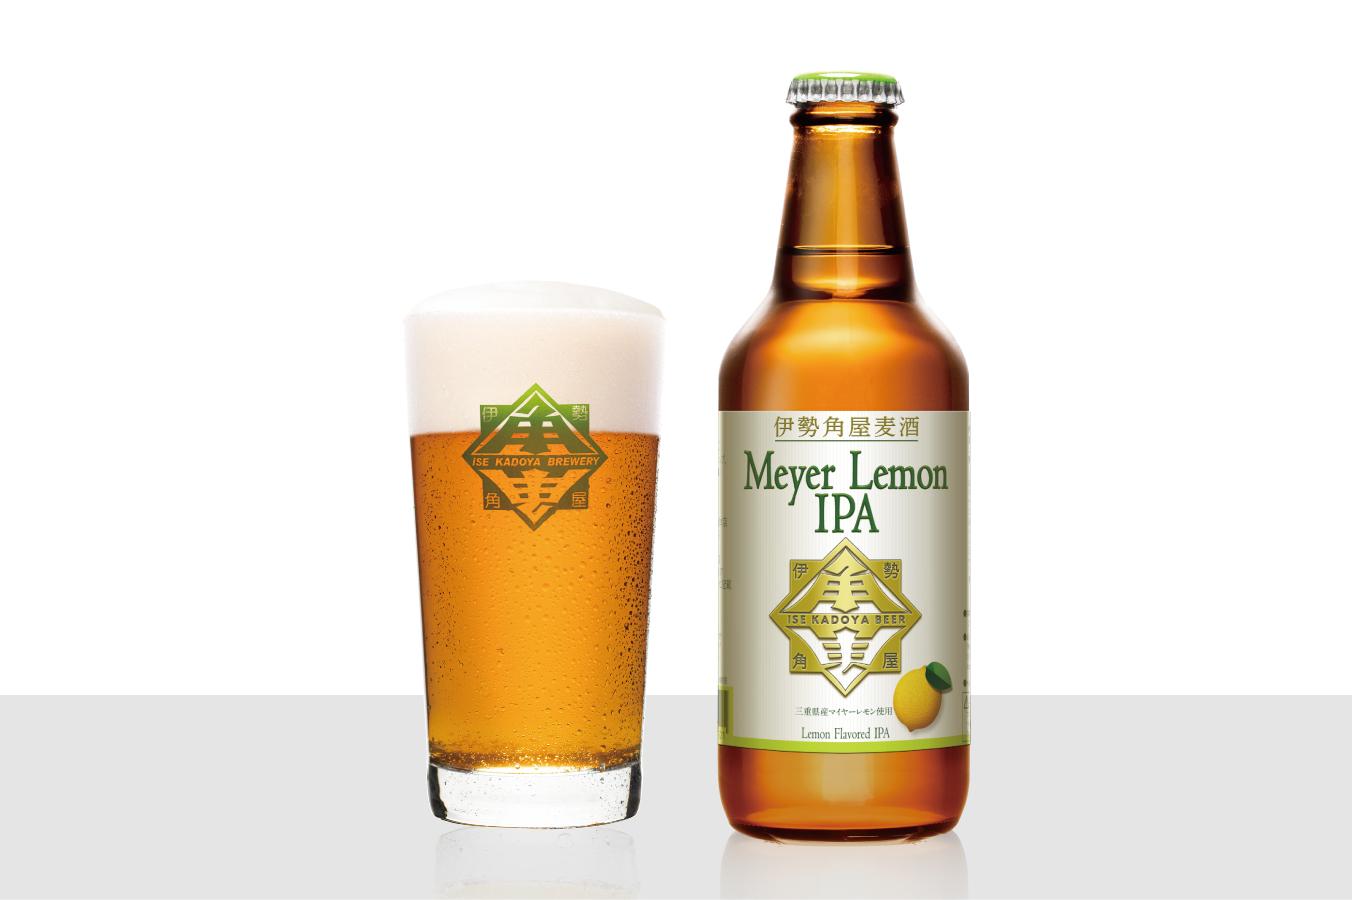 Meyer Lemon IPA